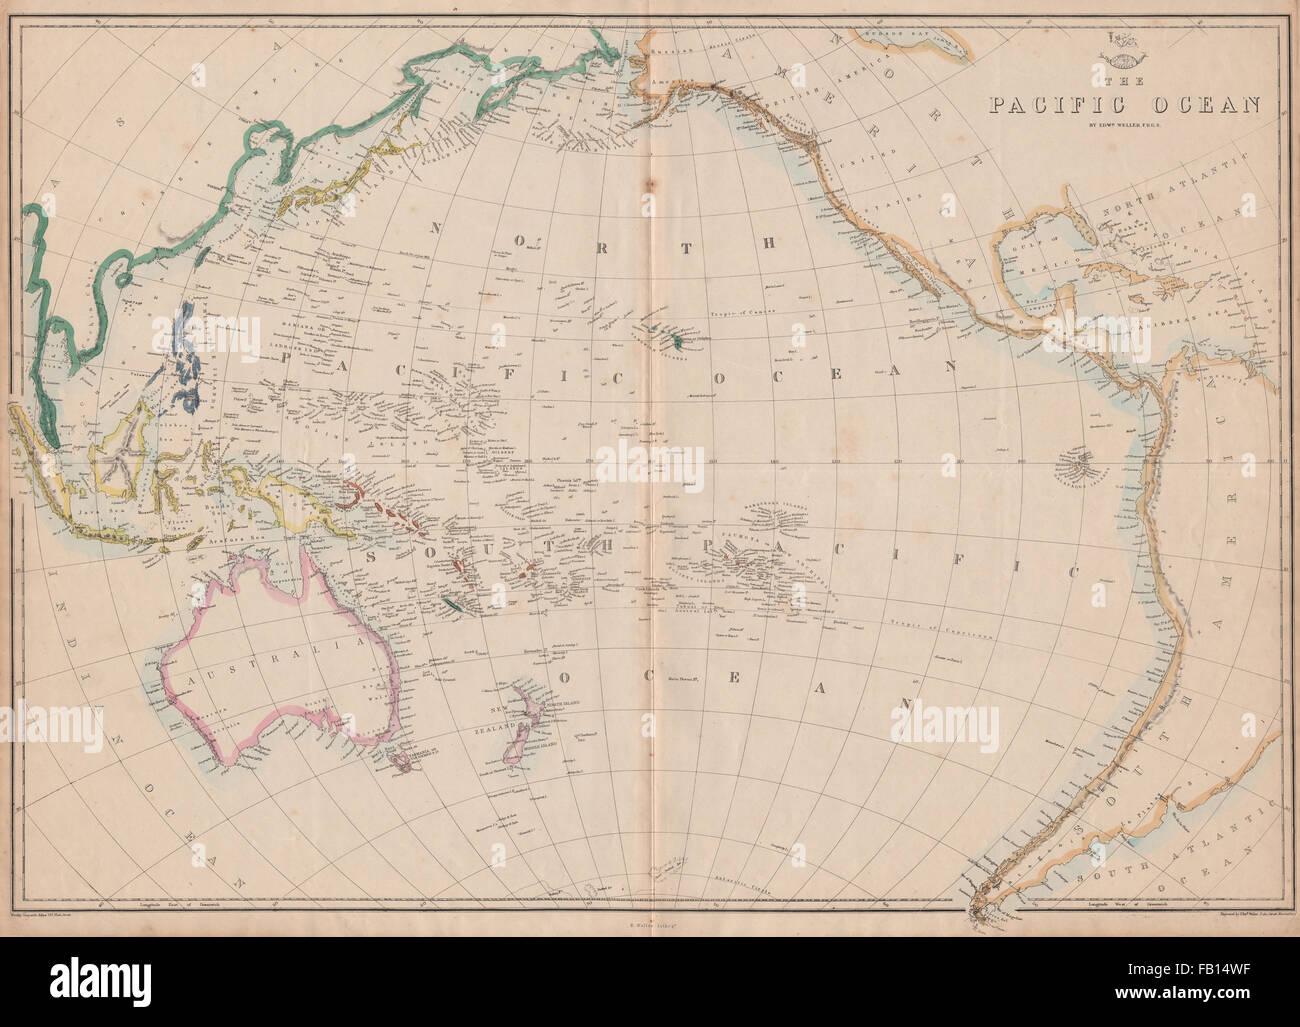 Pacific ocean sandwich islandshawaii australia new zealand c stock pacific ocean sandwich islandshawaii australia new zealand c weller 1862 map gumiabroncs Gallery